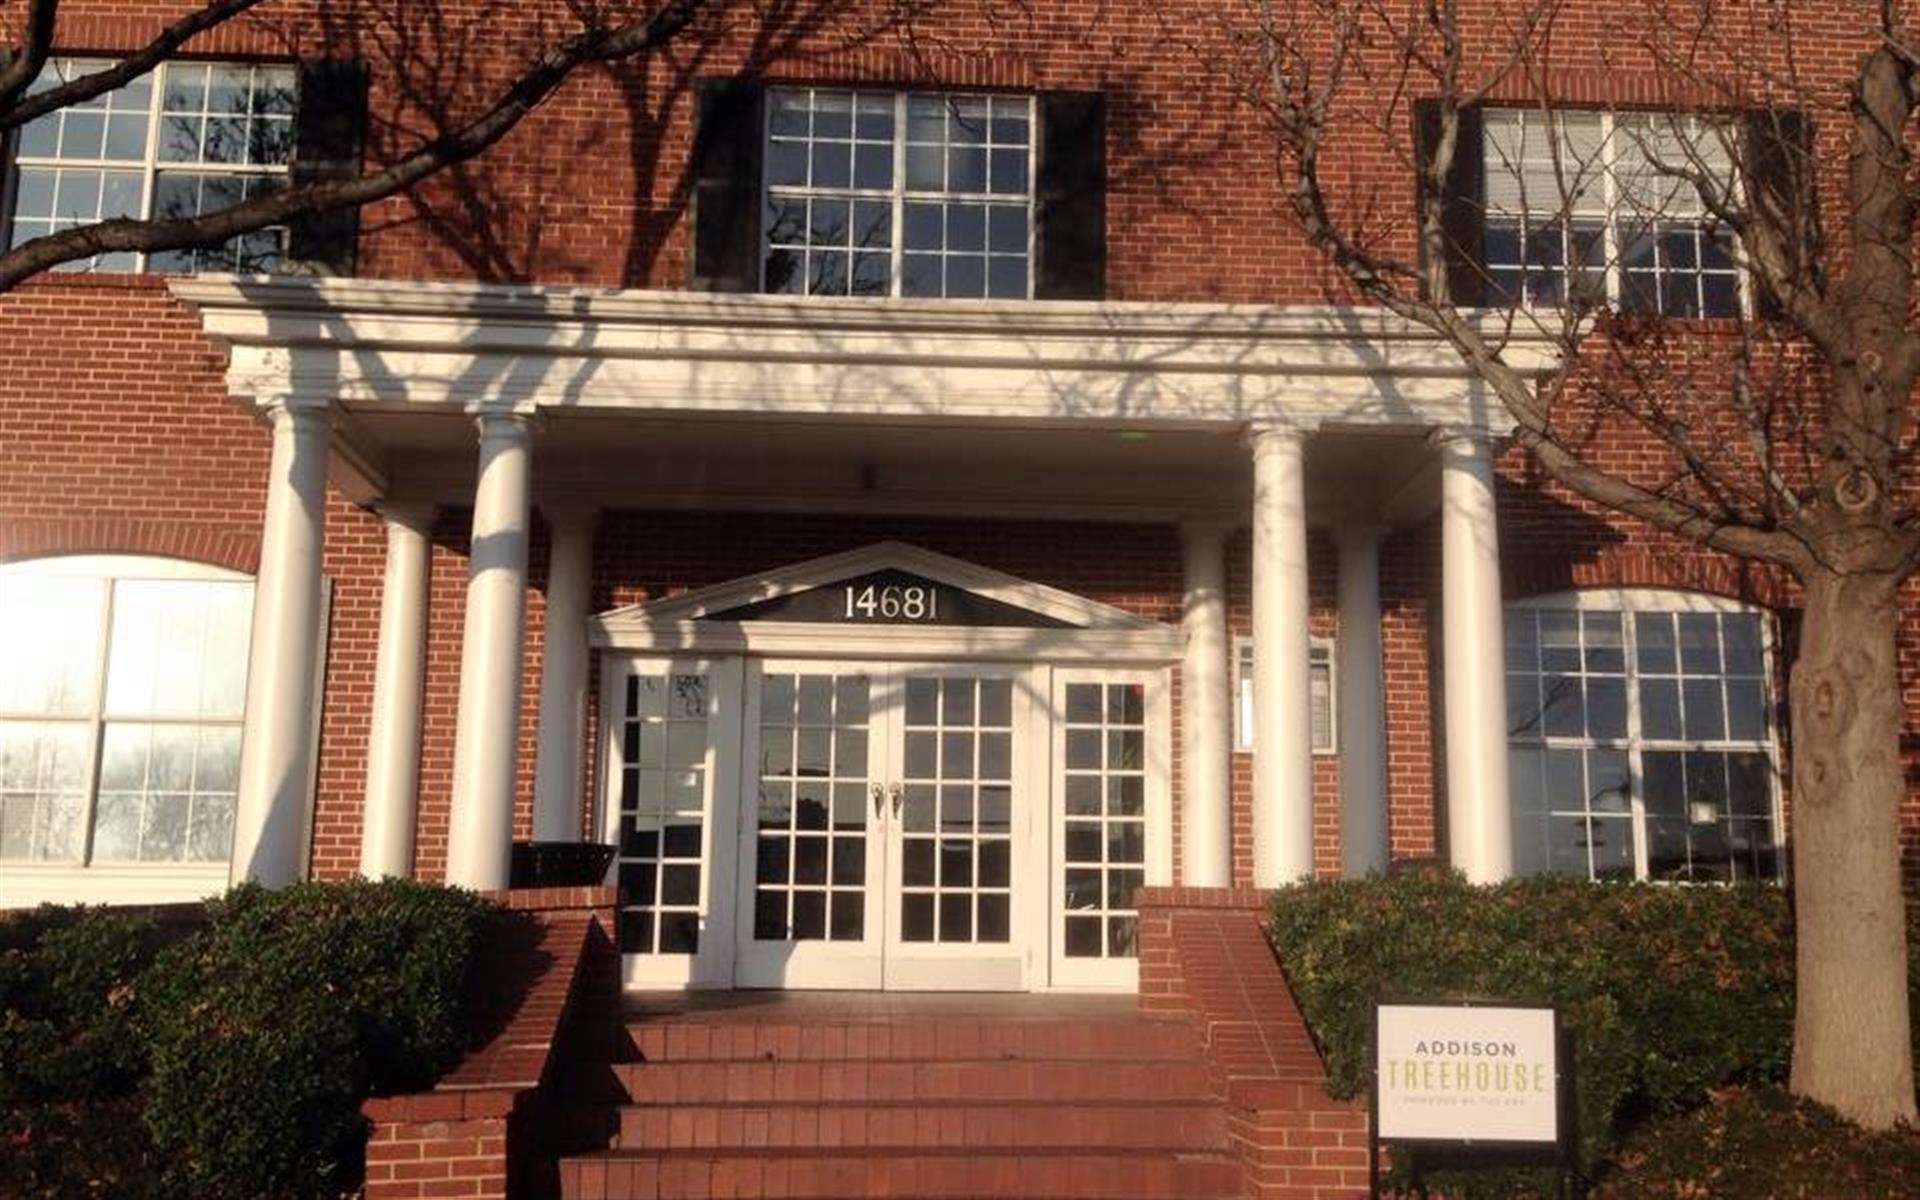 The Addison TreeHouse